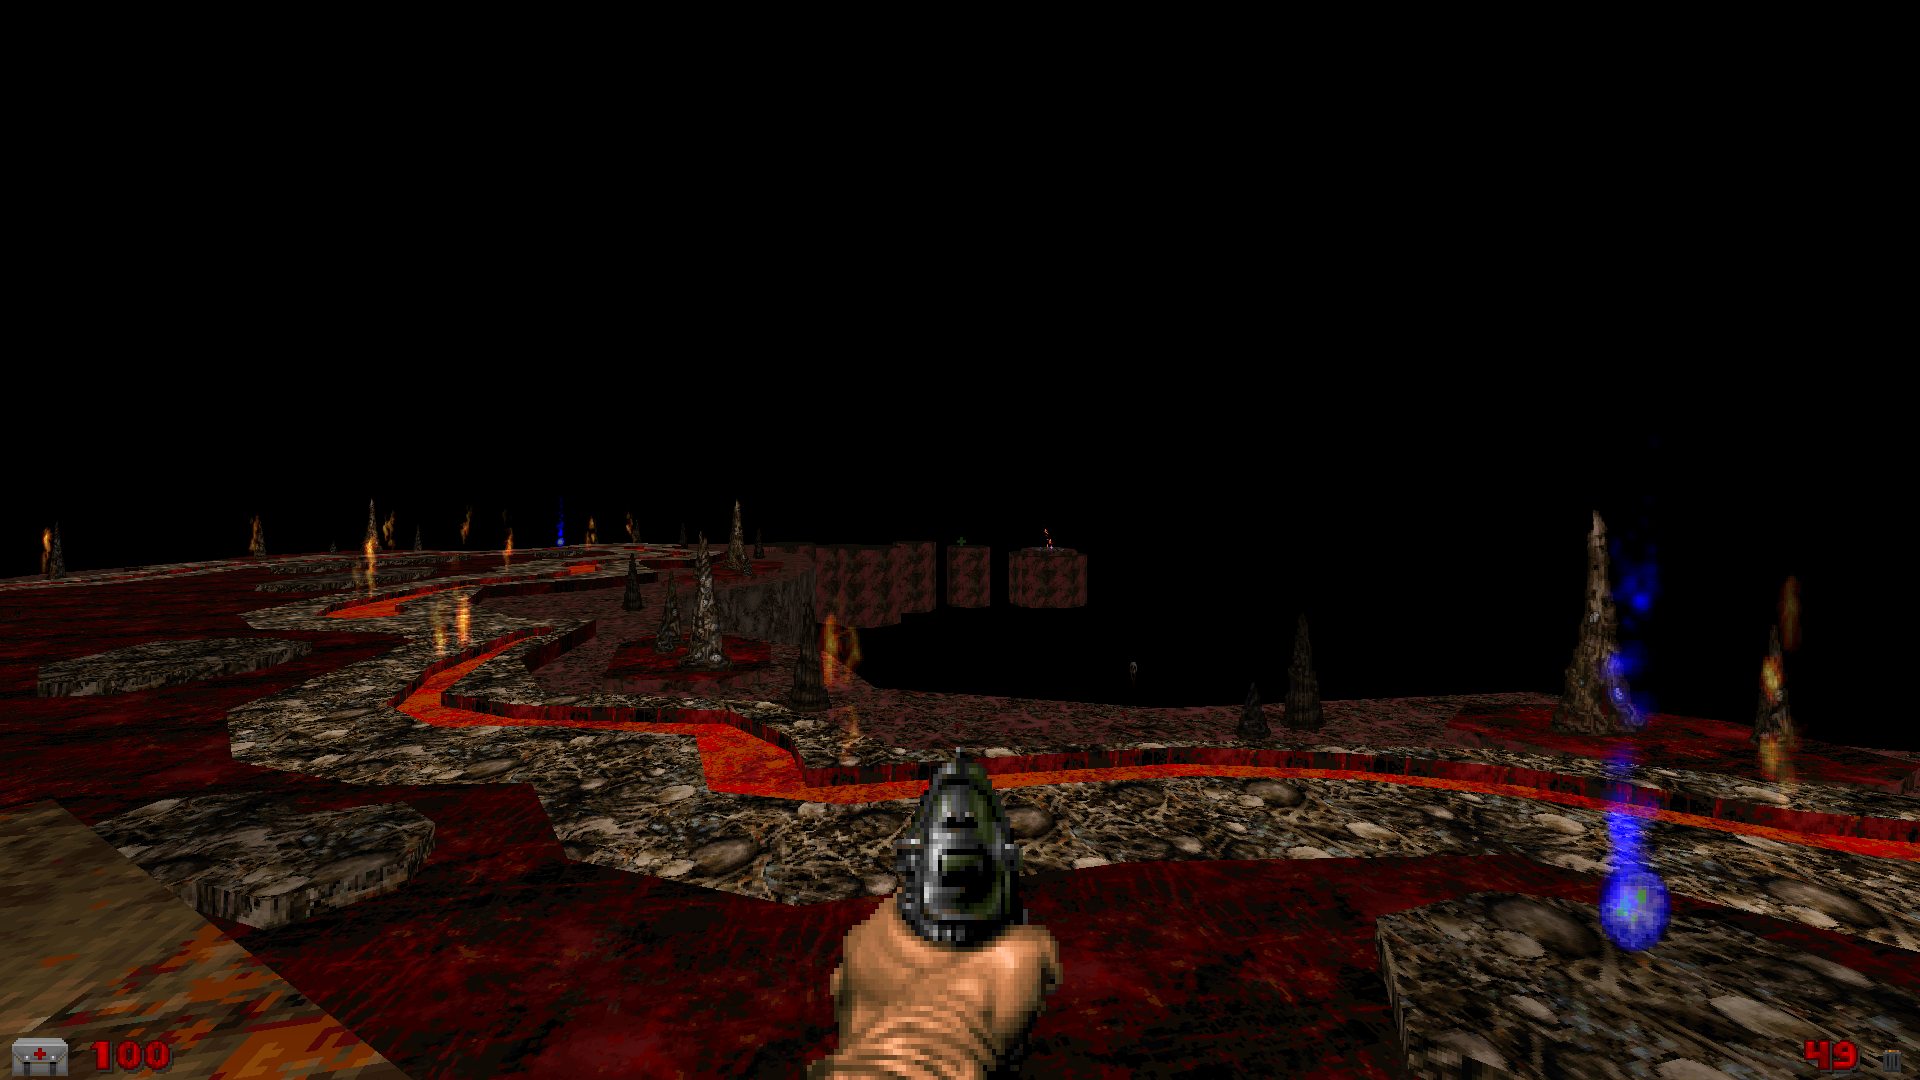 Screenshot_Doom_20200420_132222.png.8a4f900afaa1dc319433a649e41503a9.png